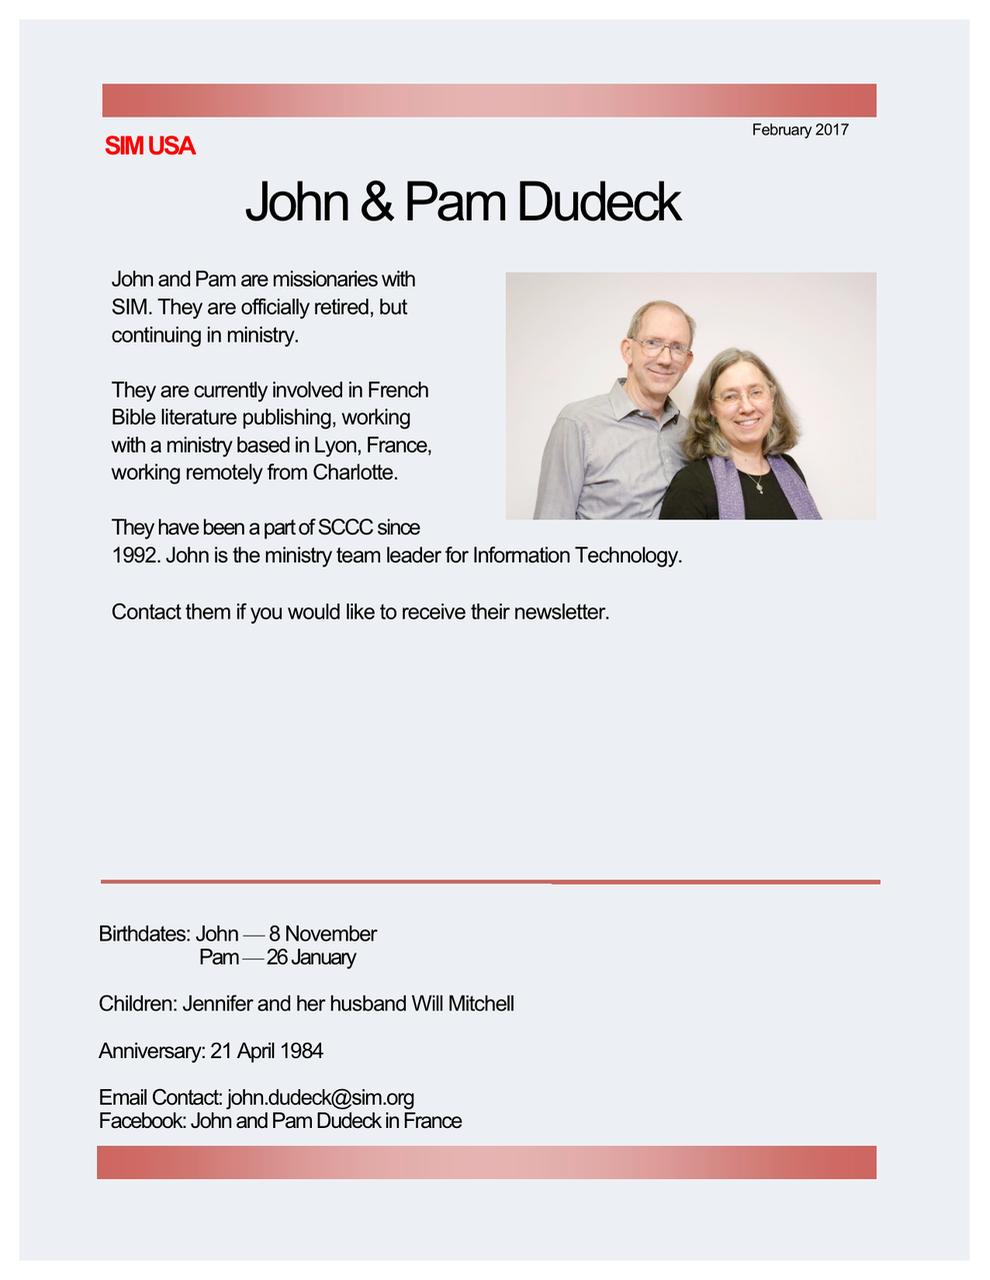 John and Pam Dudeck